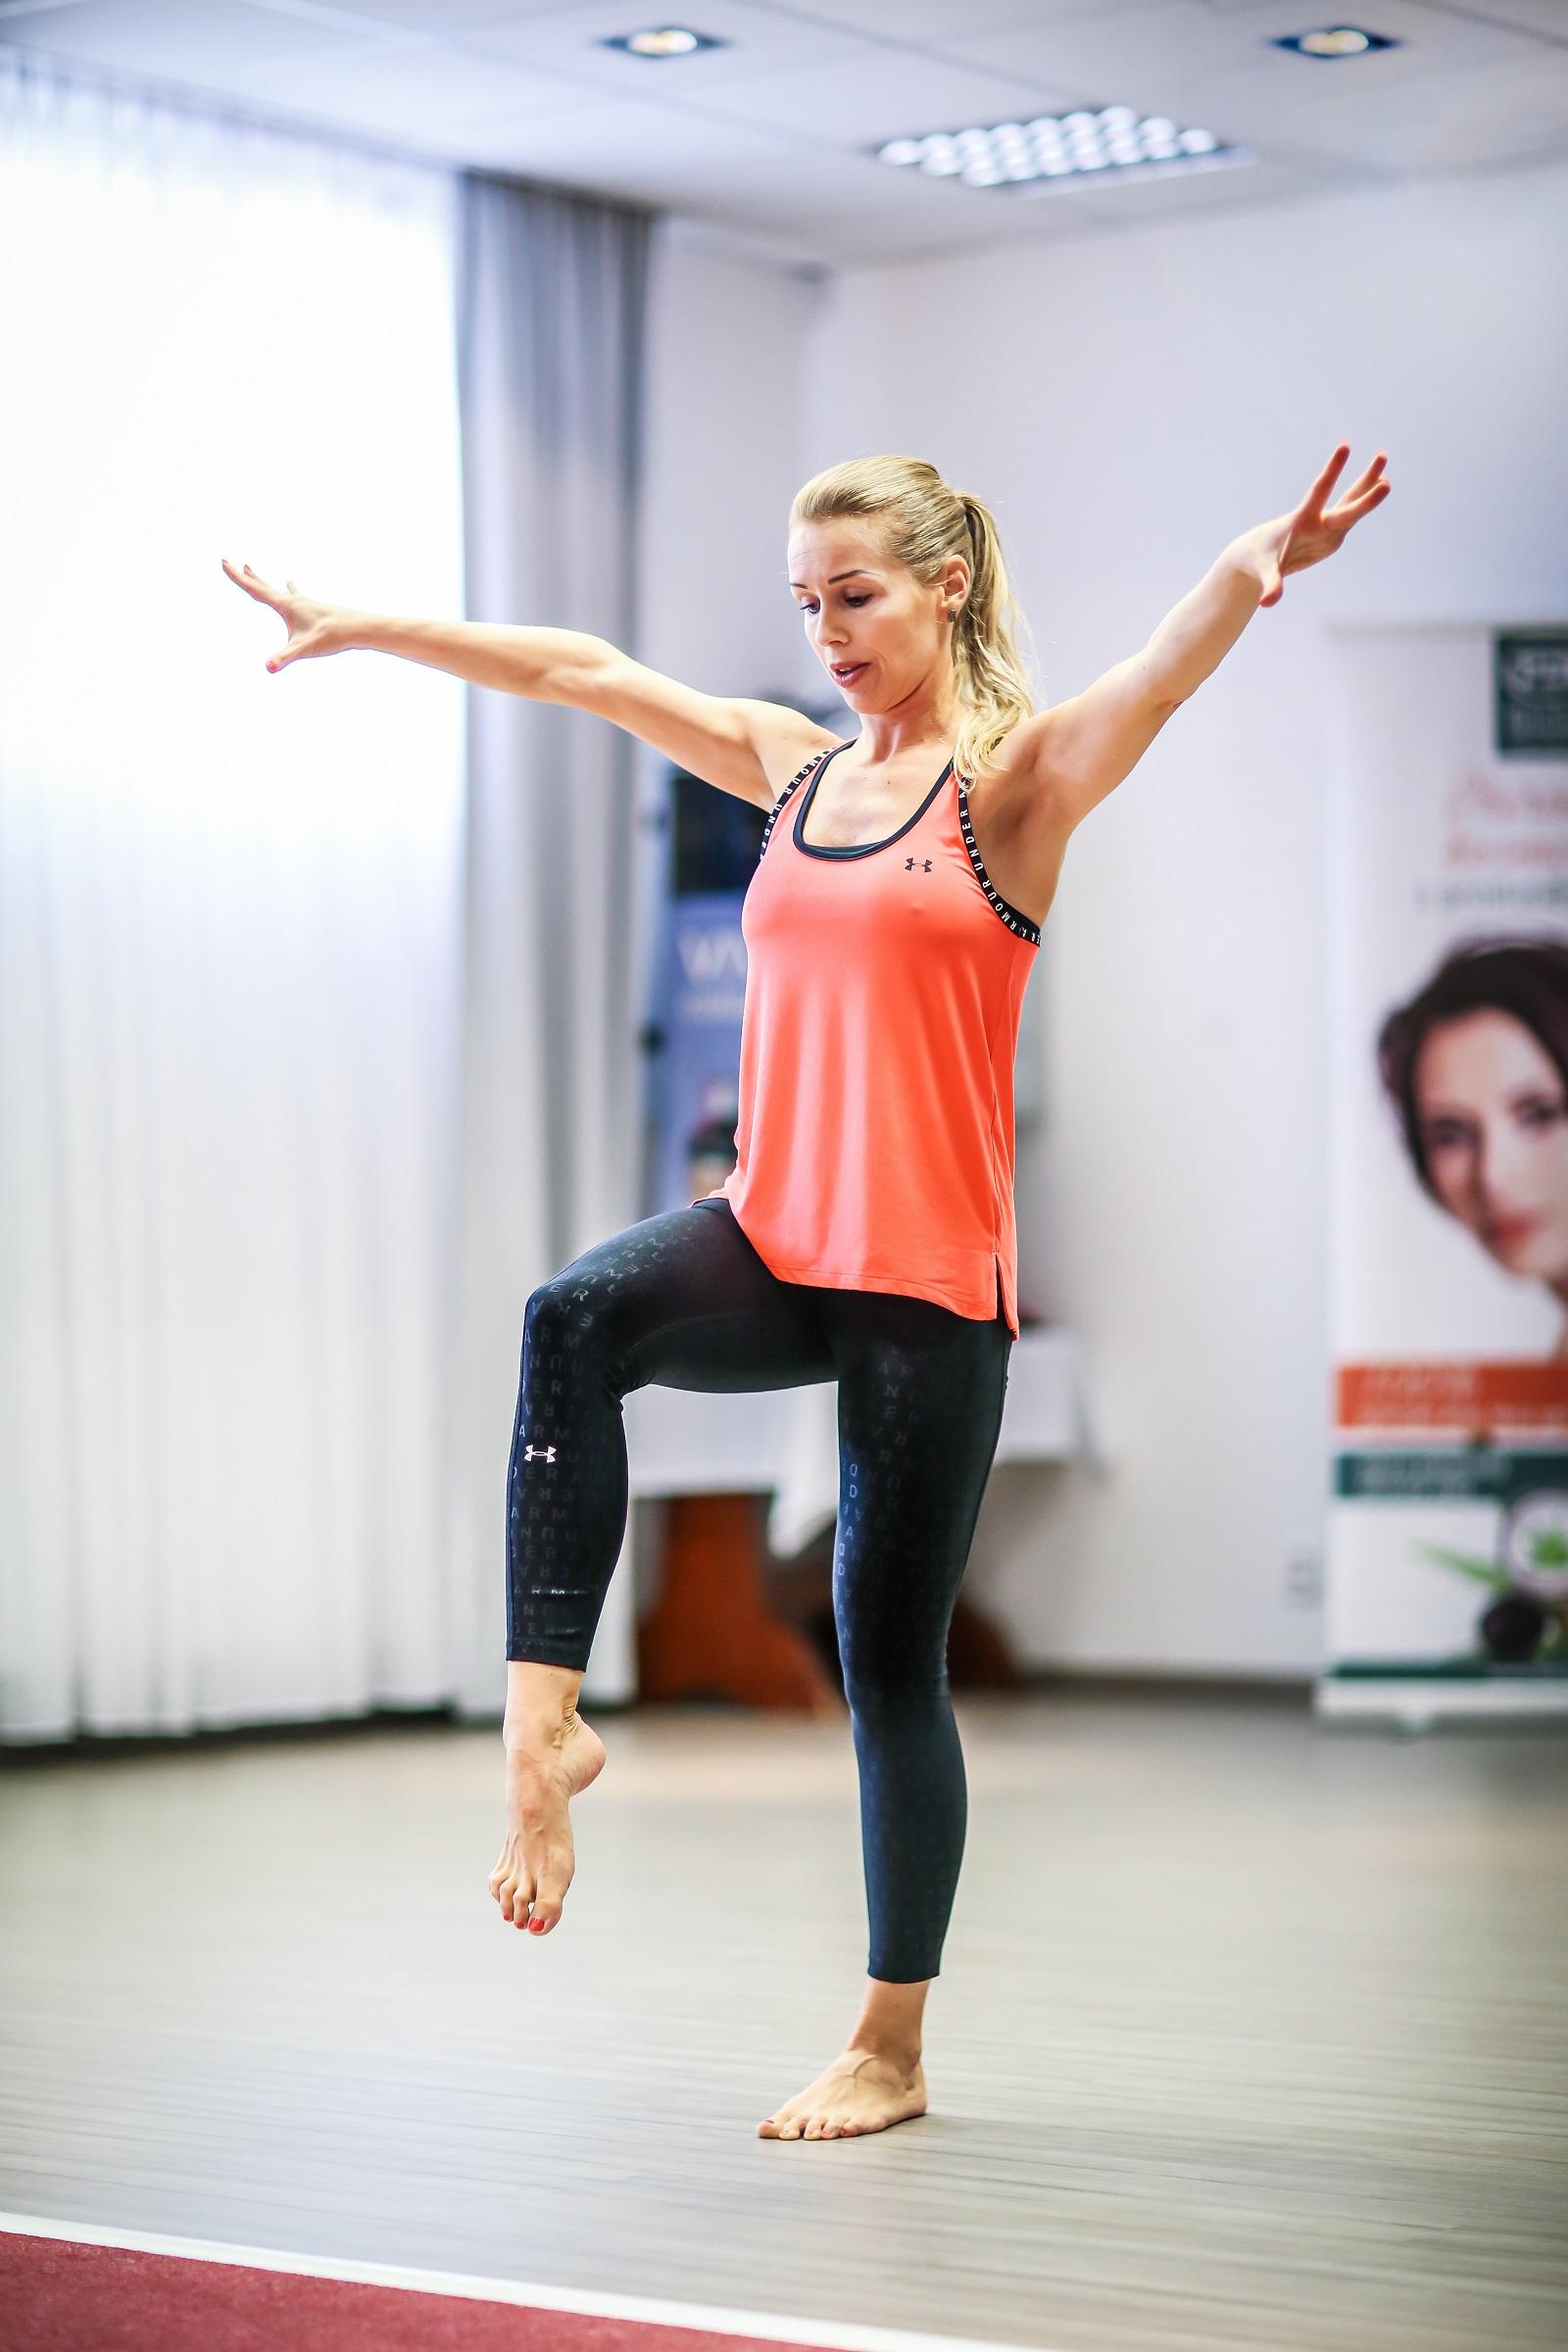 fitness-trenerka-cviceni-odbourani-tuku-posileni-svalstva-metabolismus-zdravi-harmonieteladuse-ceskytesin